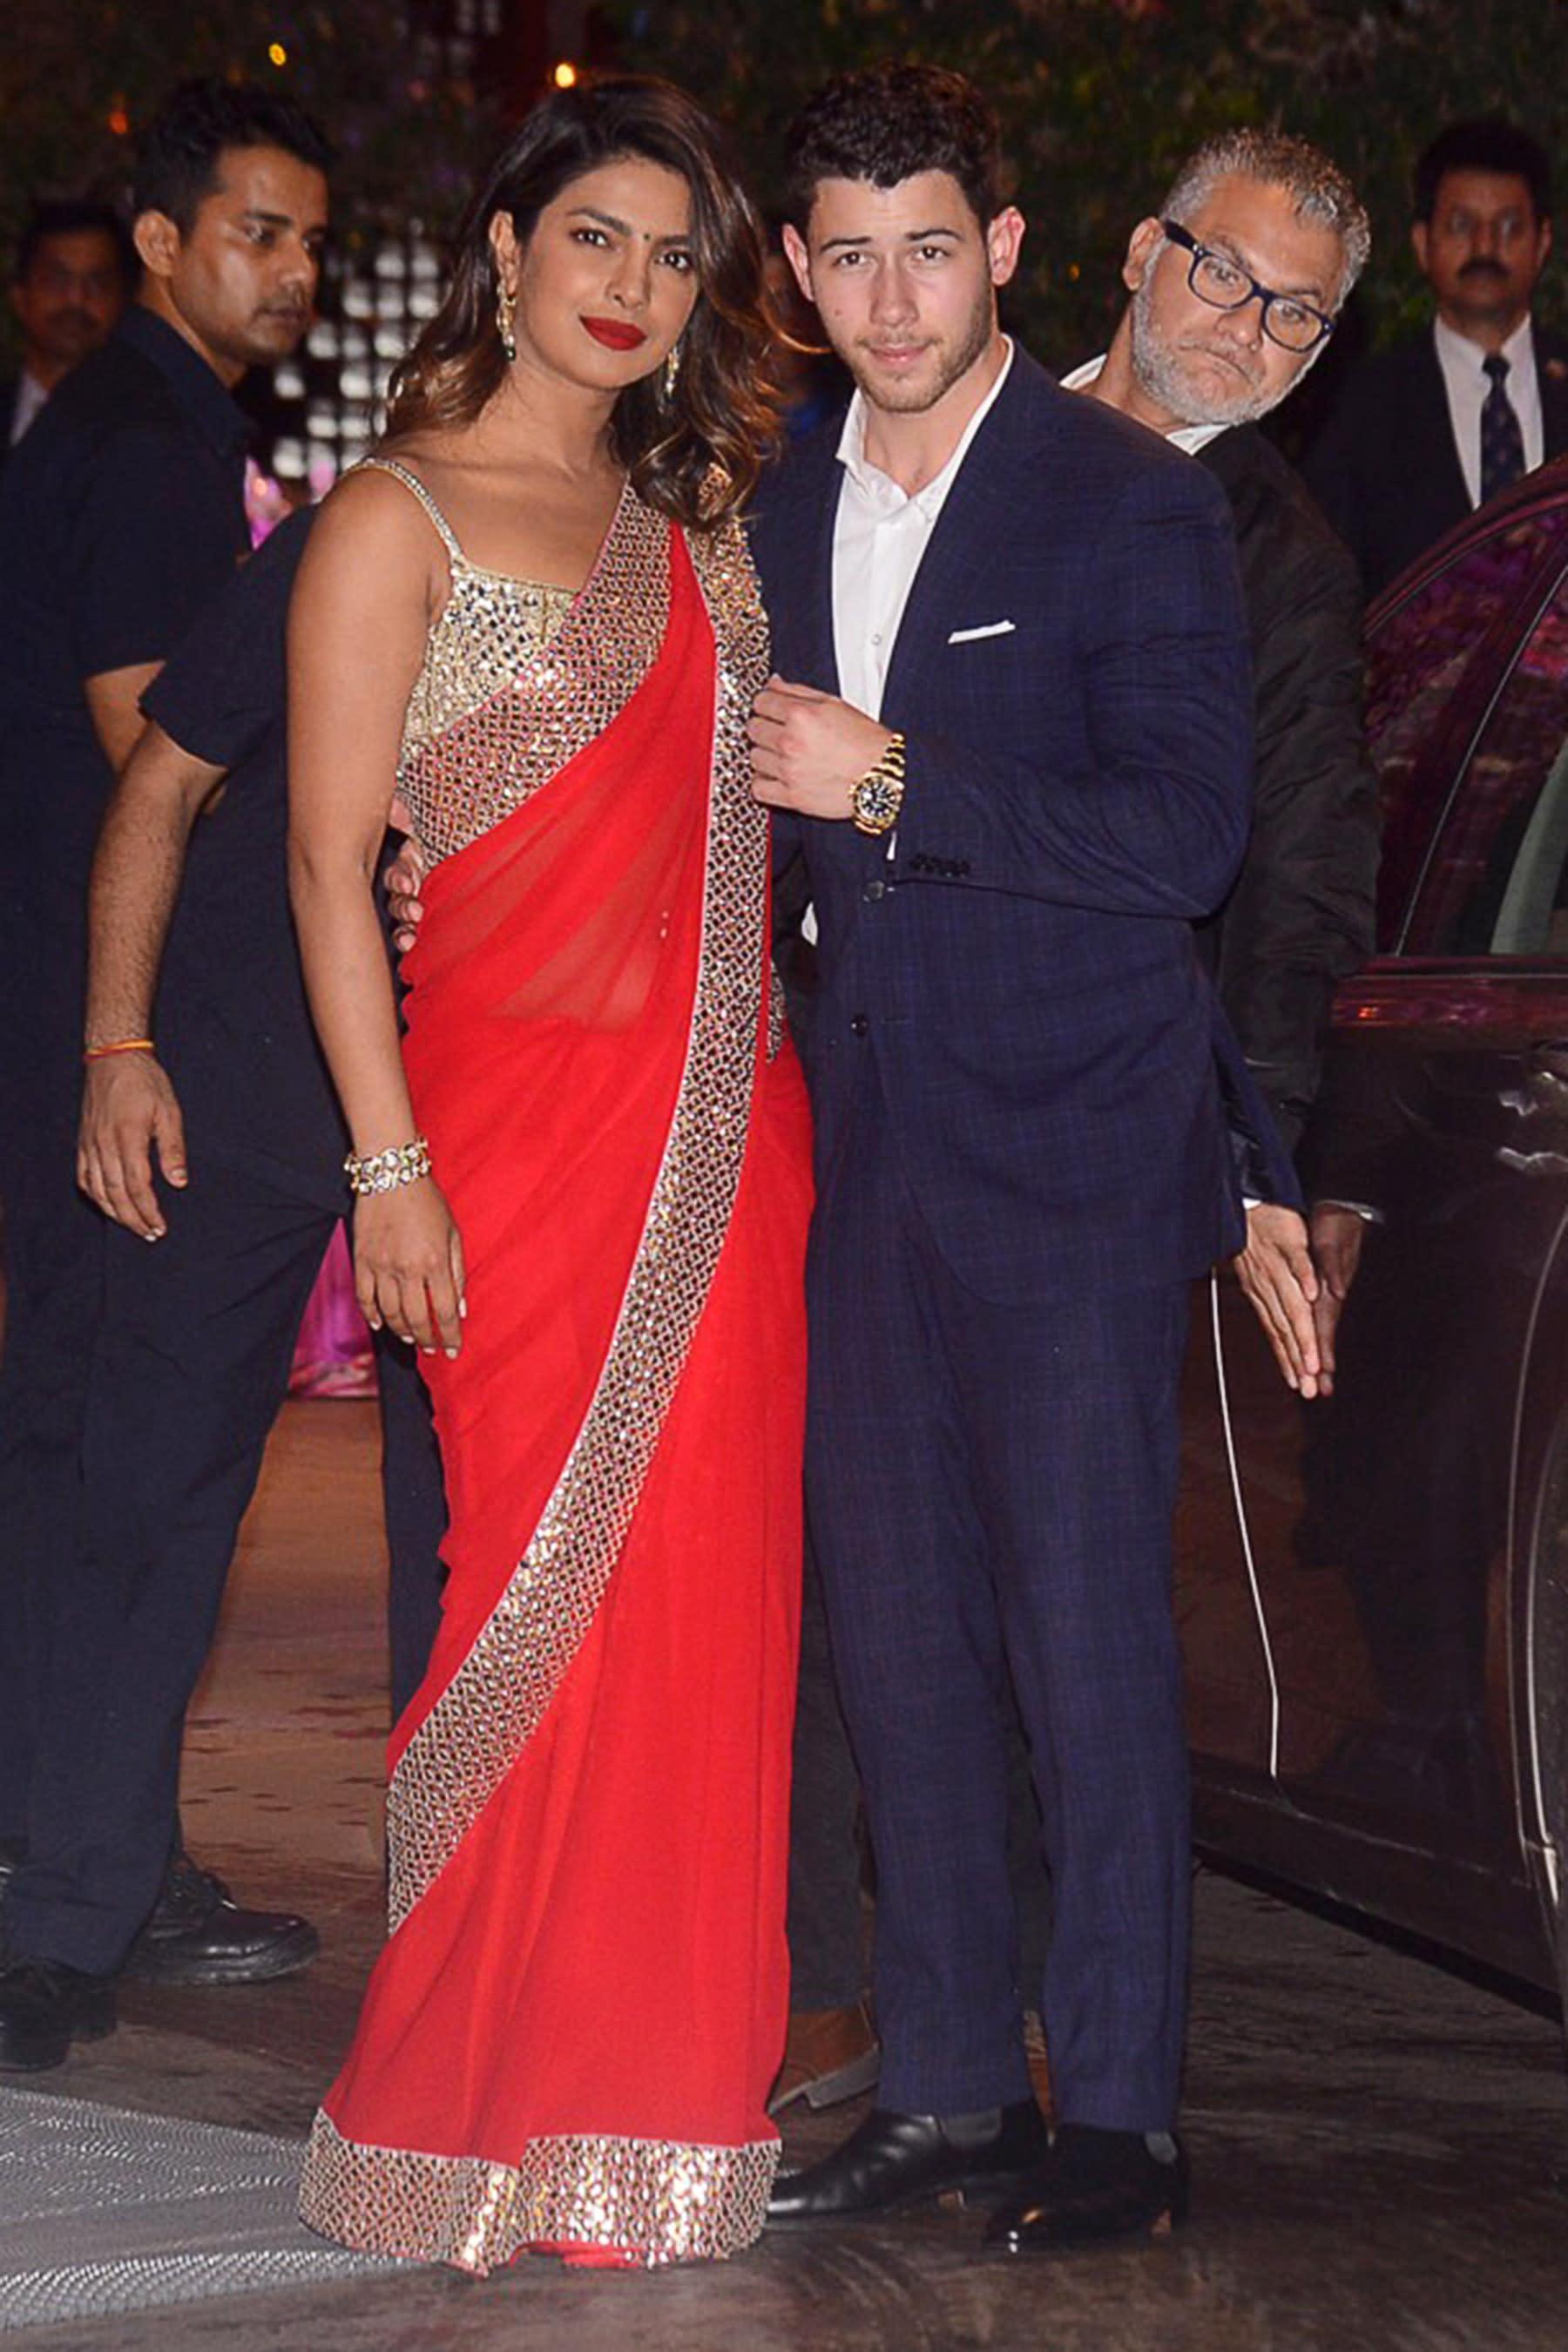 Very Mature Nick Jonas Loves That Fiancee Priyanka Chopra Is